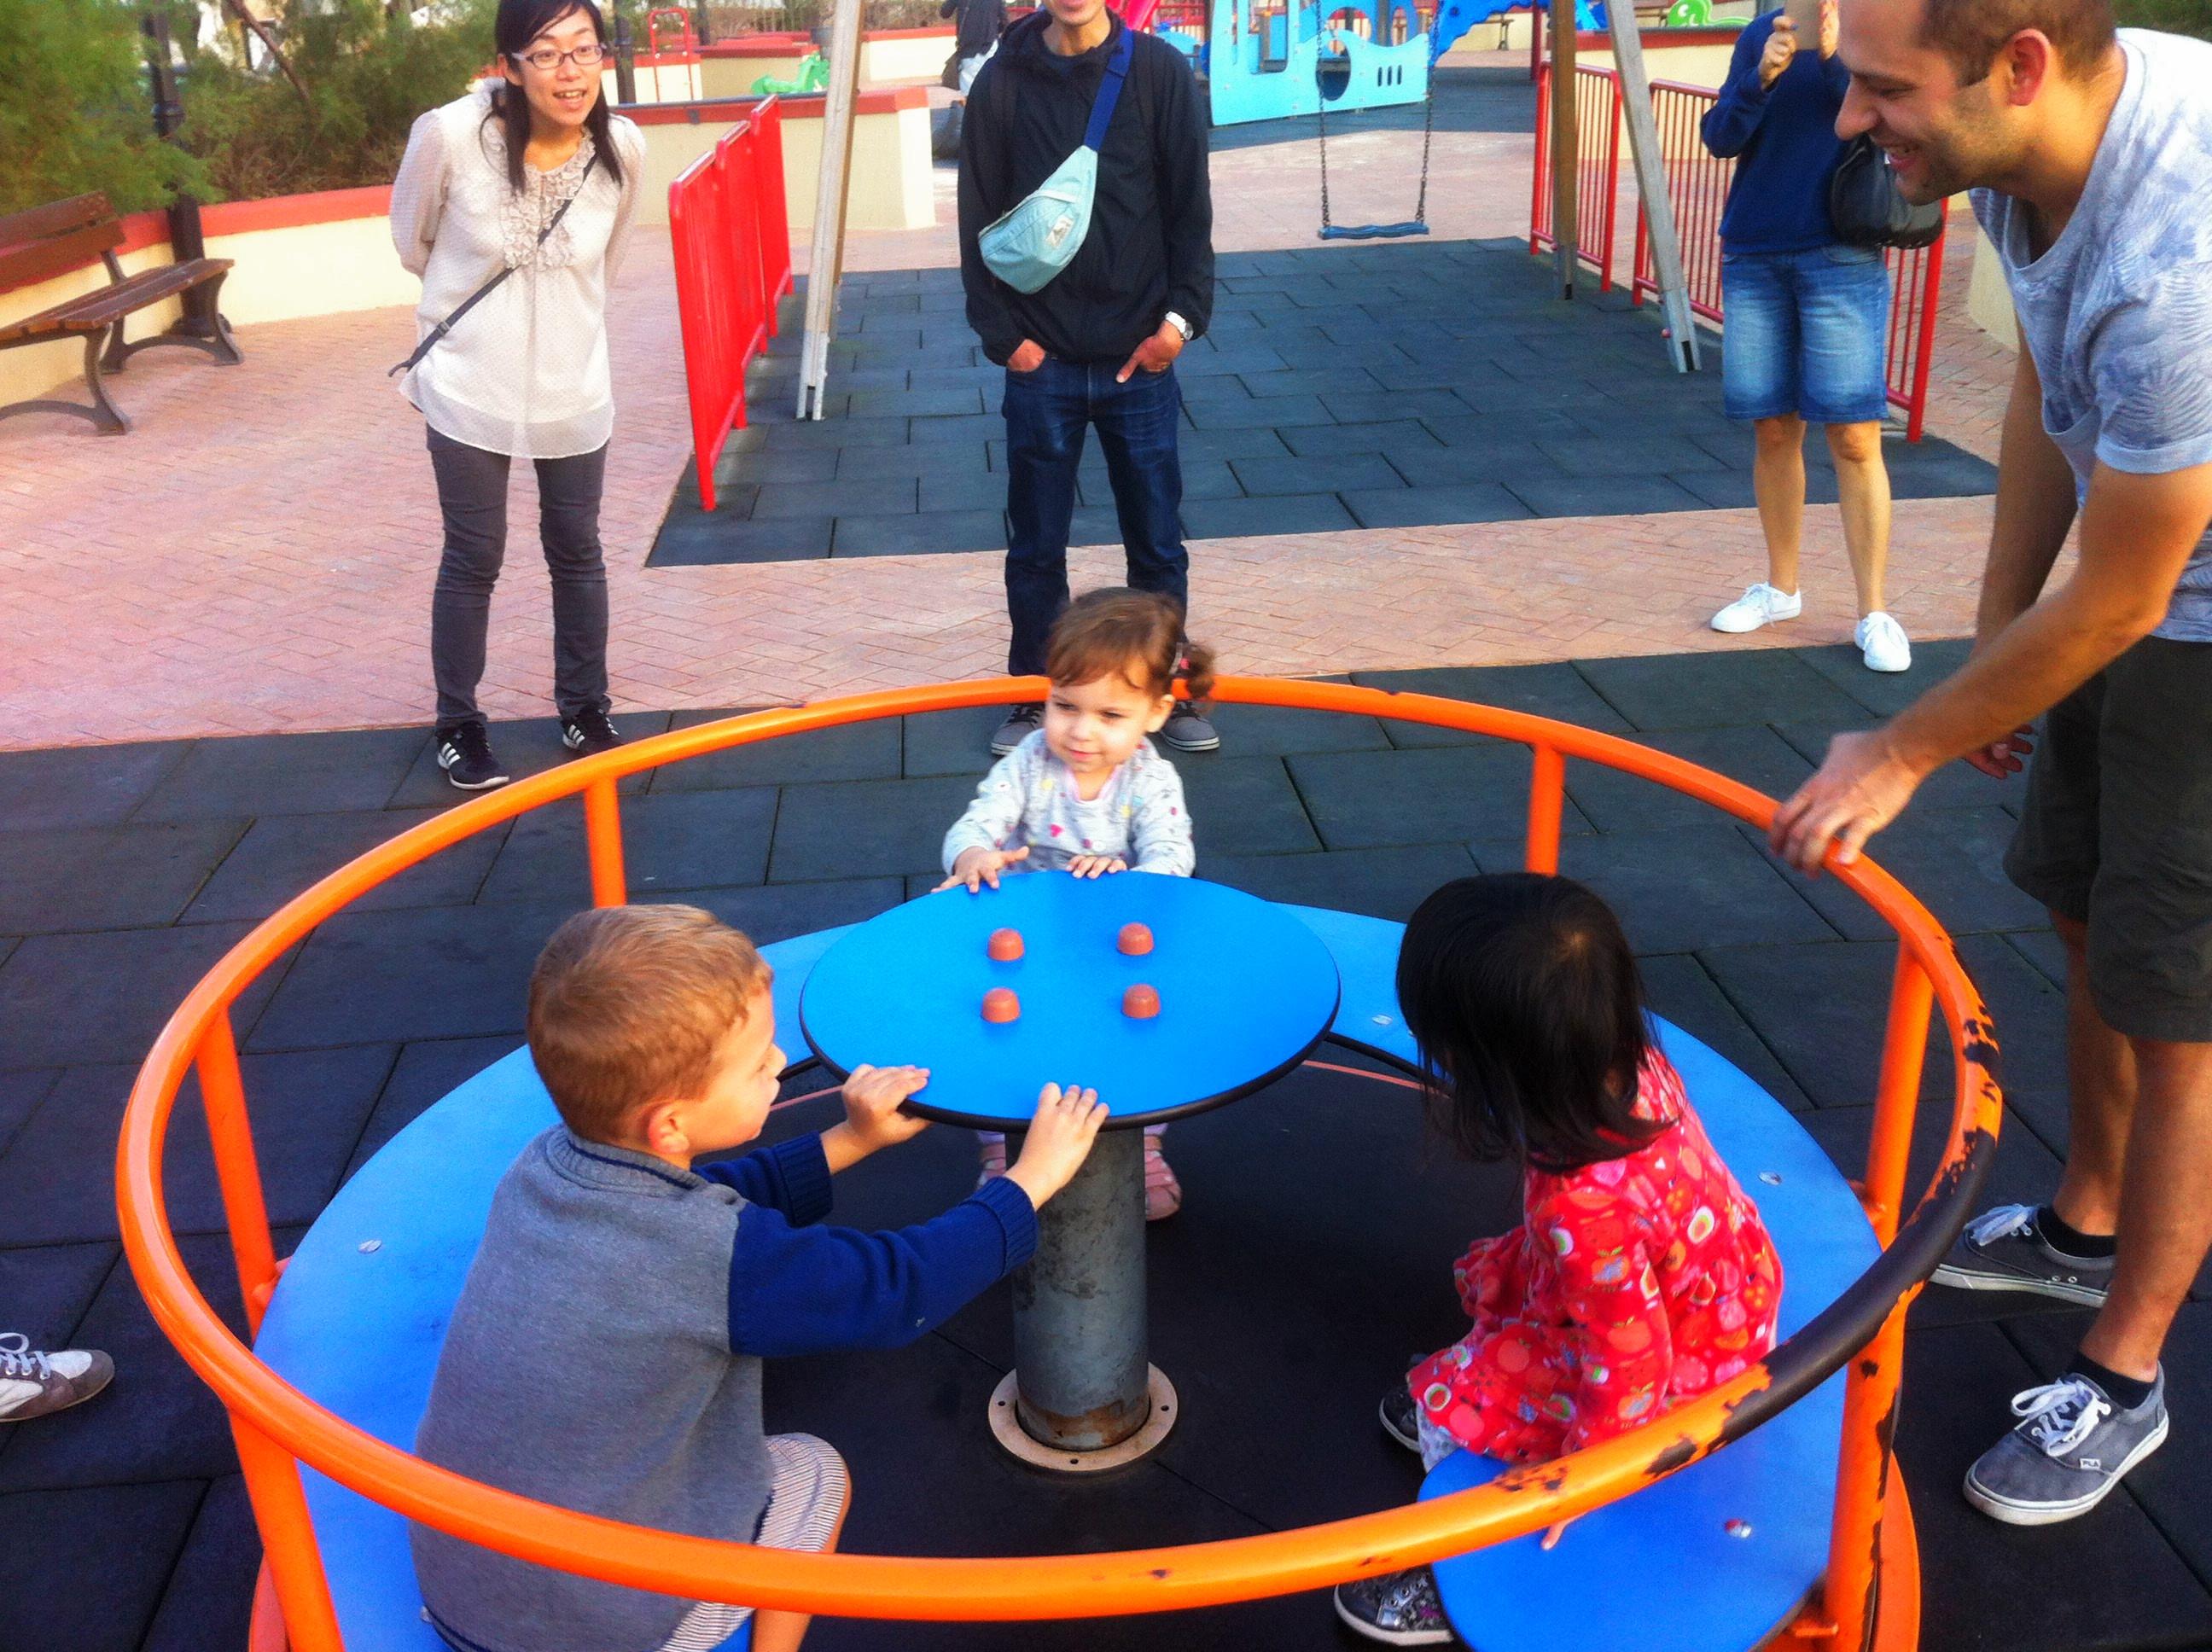 malta place zabaw